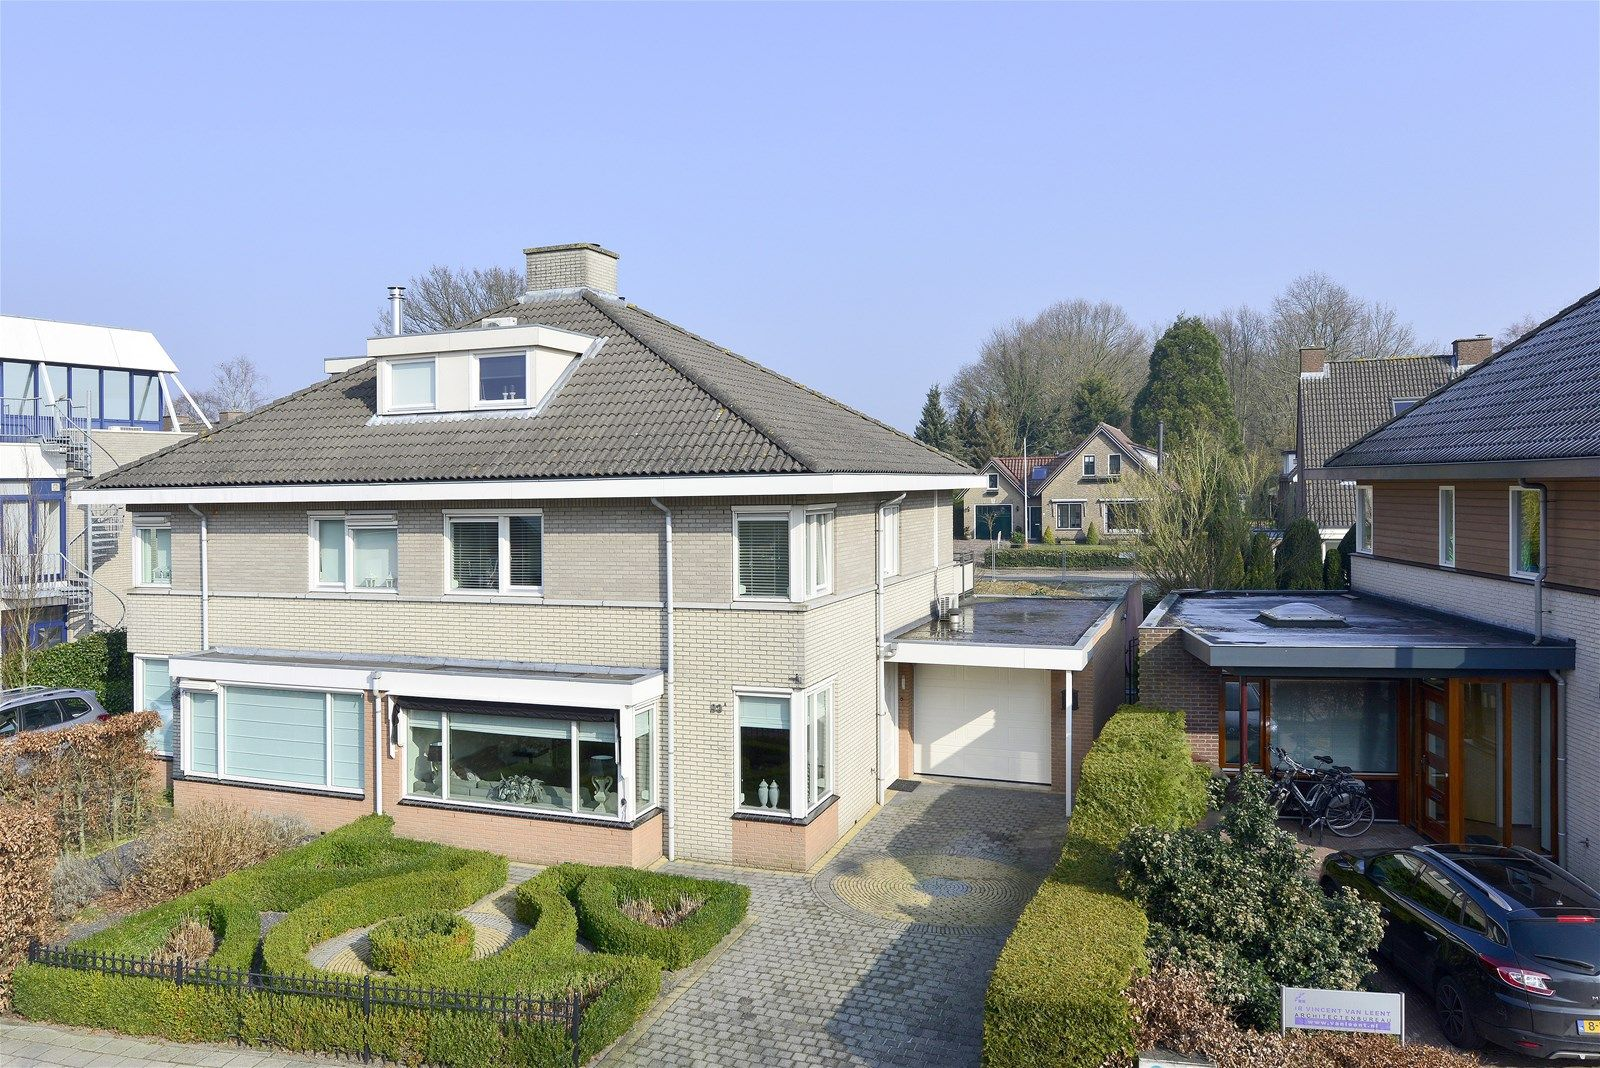 Nieuweweg 93a, Soest